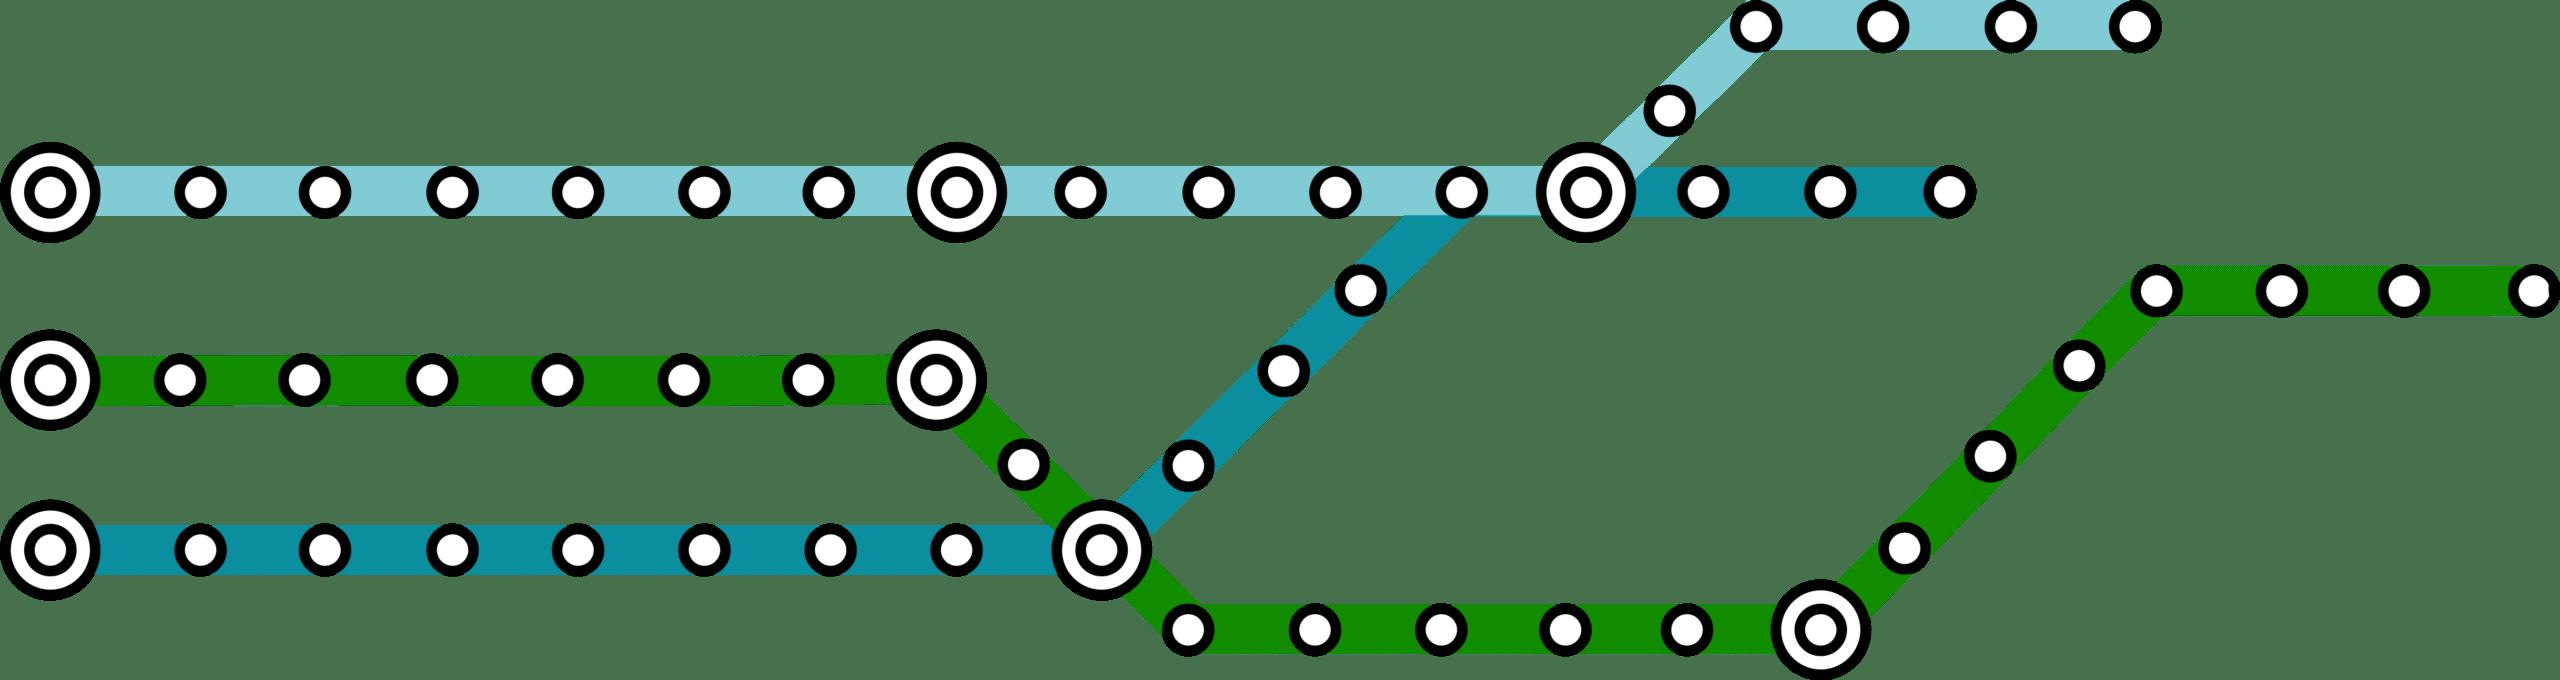 CIBO Pathways Intersecting nolabels